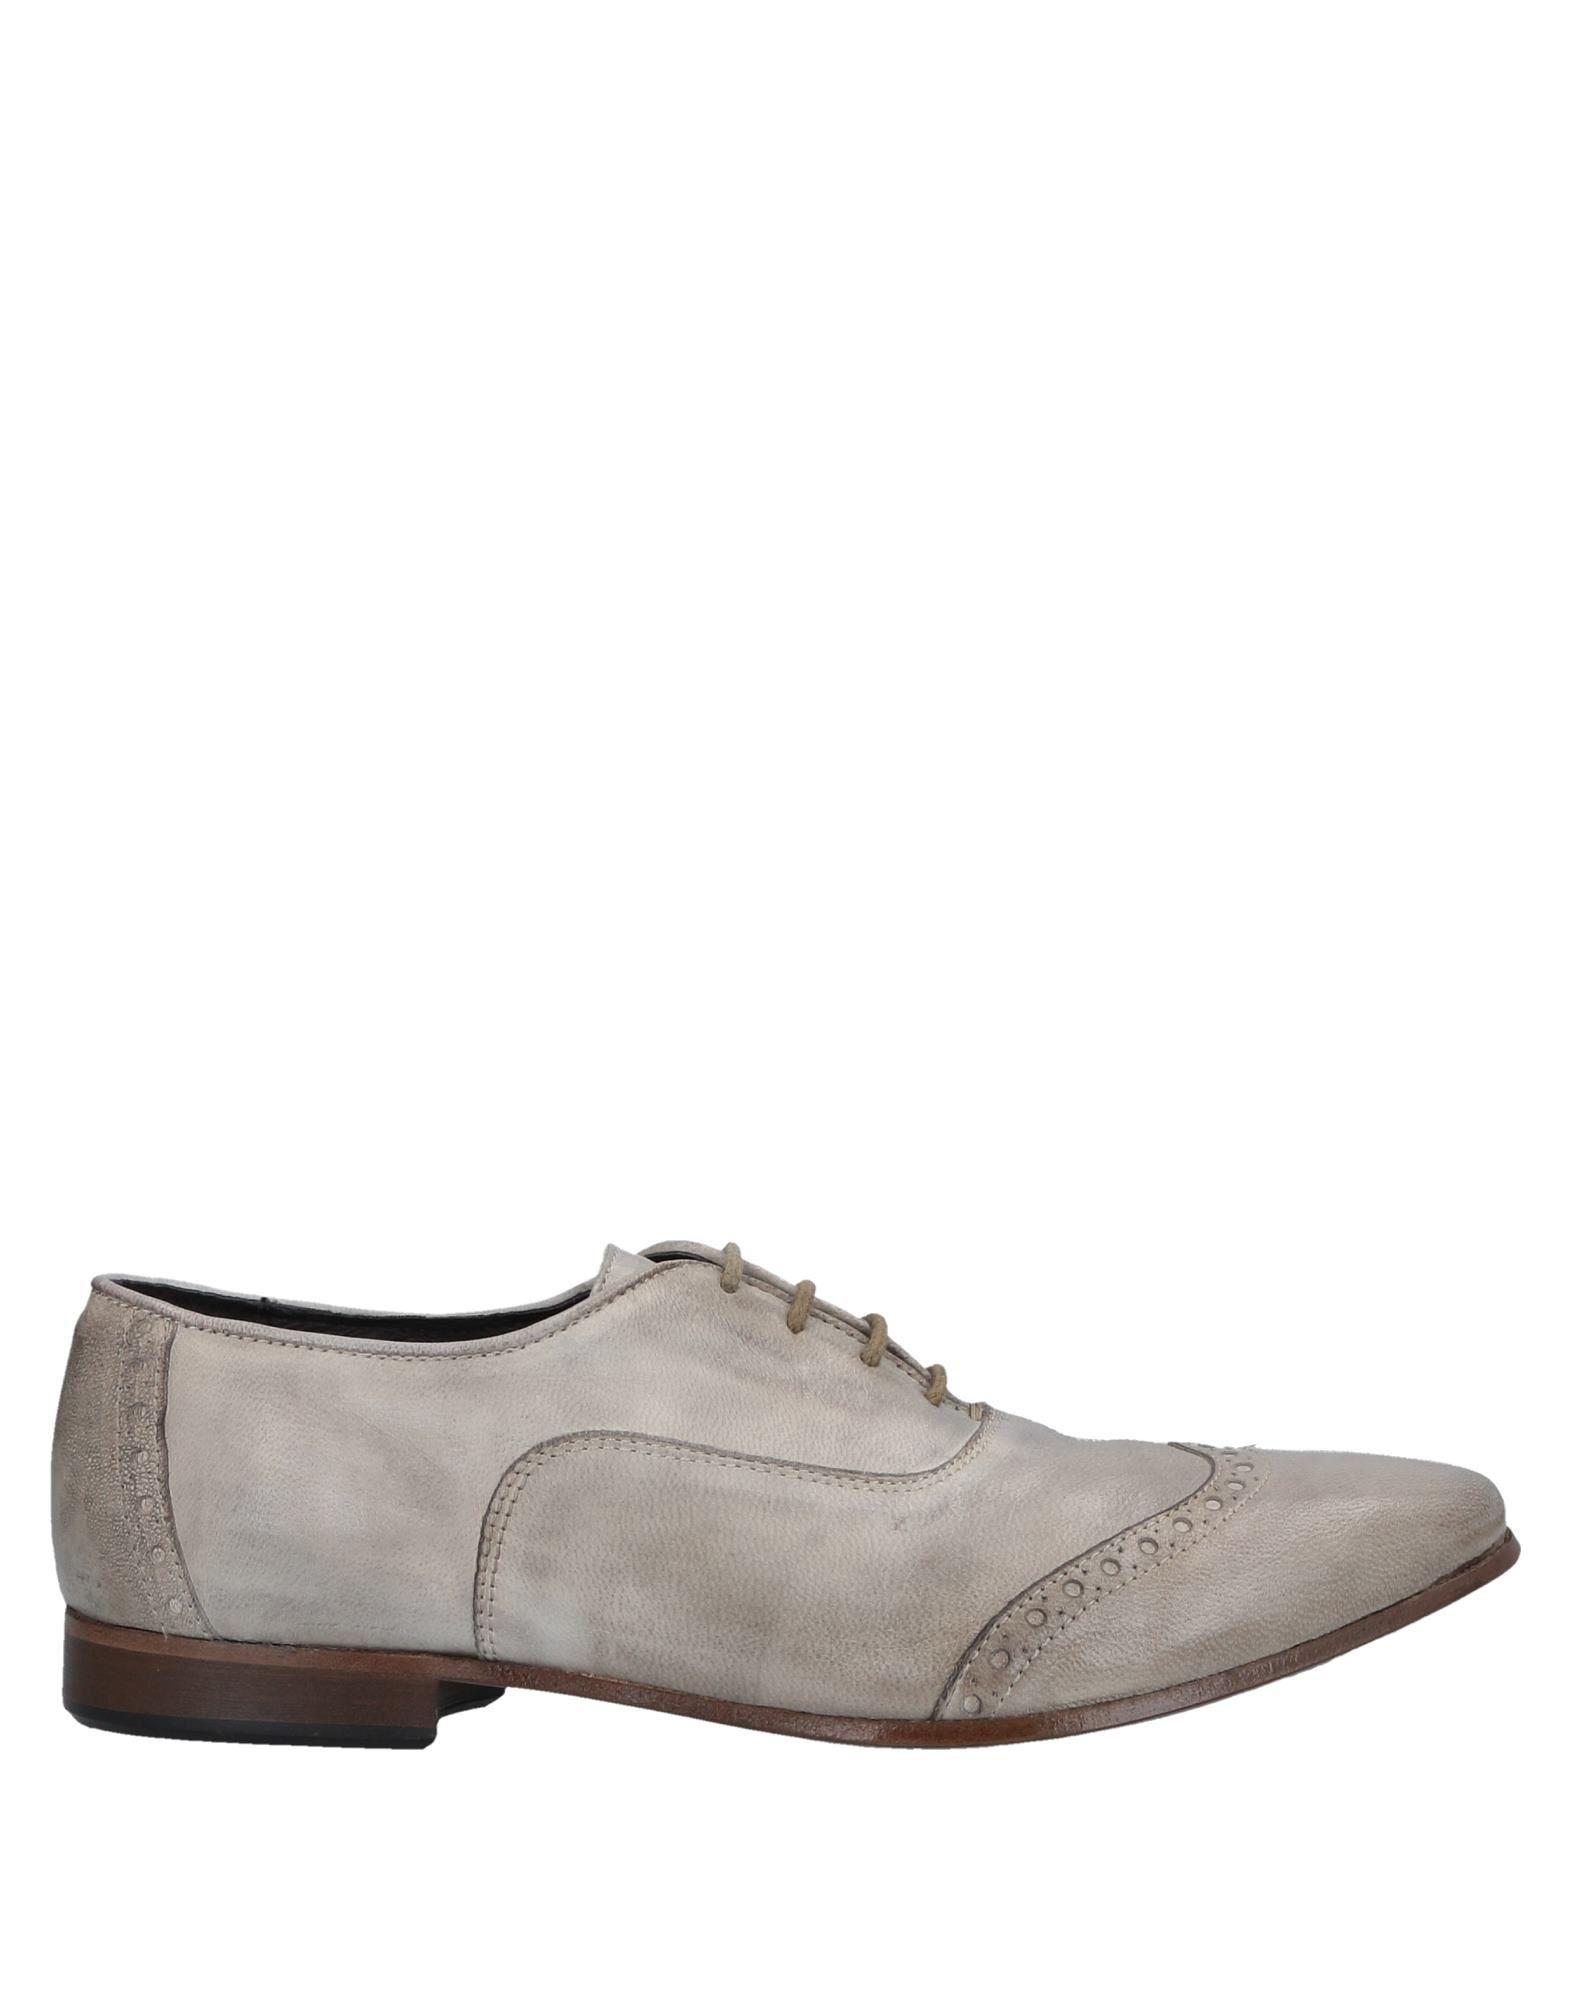 JP/DAVID Обувь на шнурках jp 247 10 фигурка кошка pavone 782432